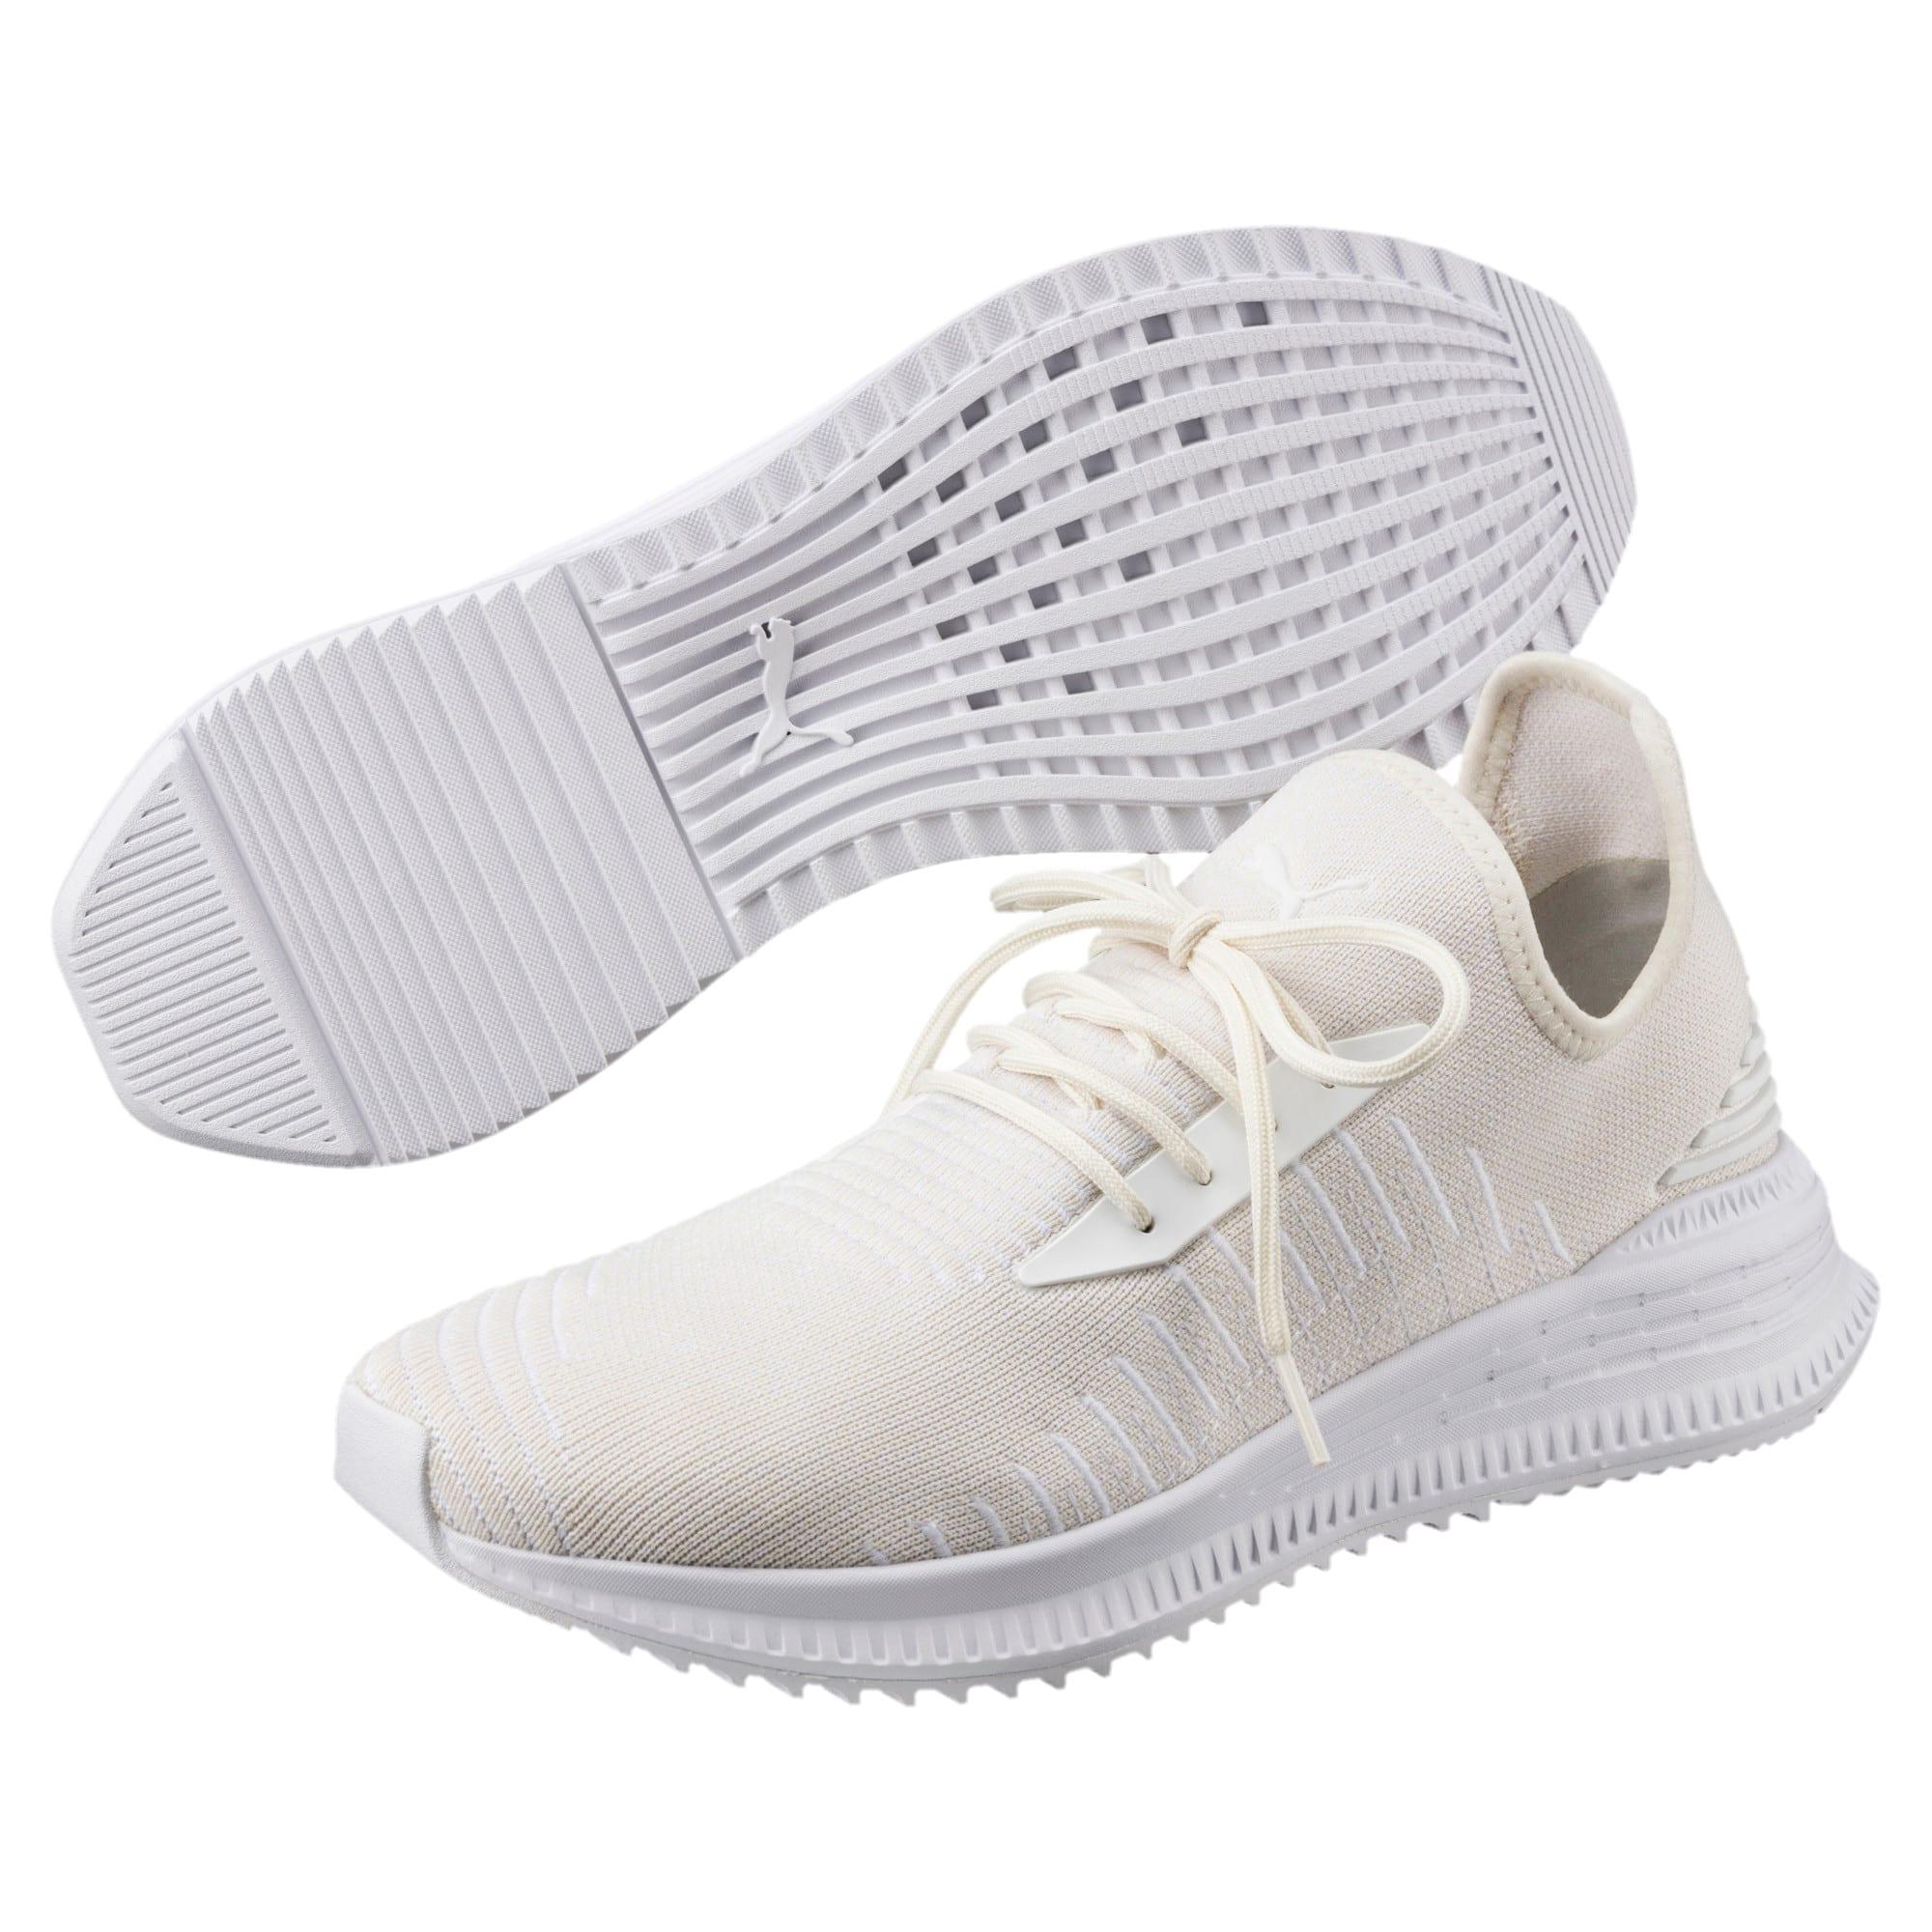 Thumbnail 2 of AVID Men's Sneakers, Whisper White-Puma White, medium